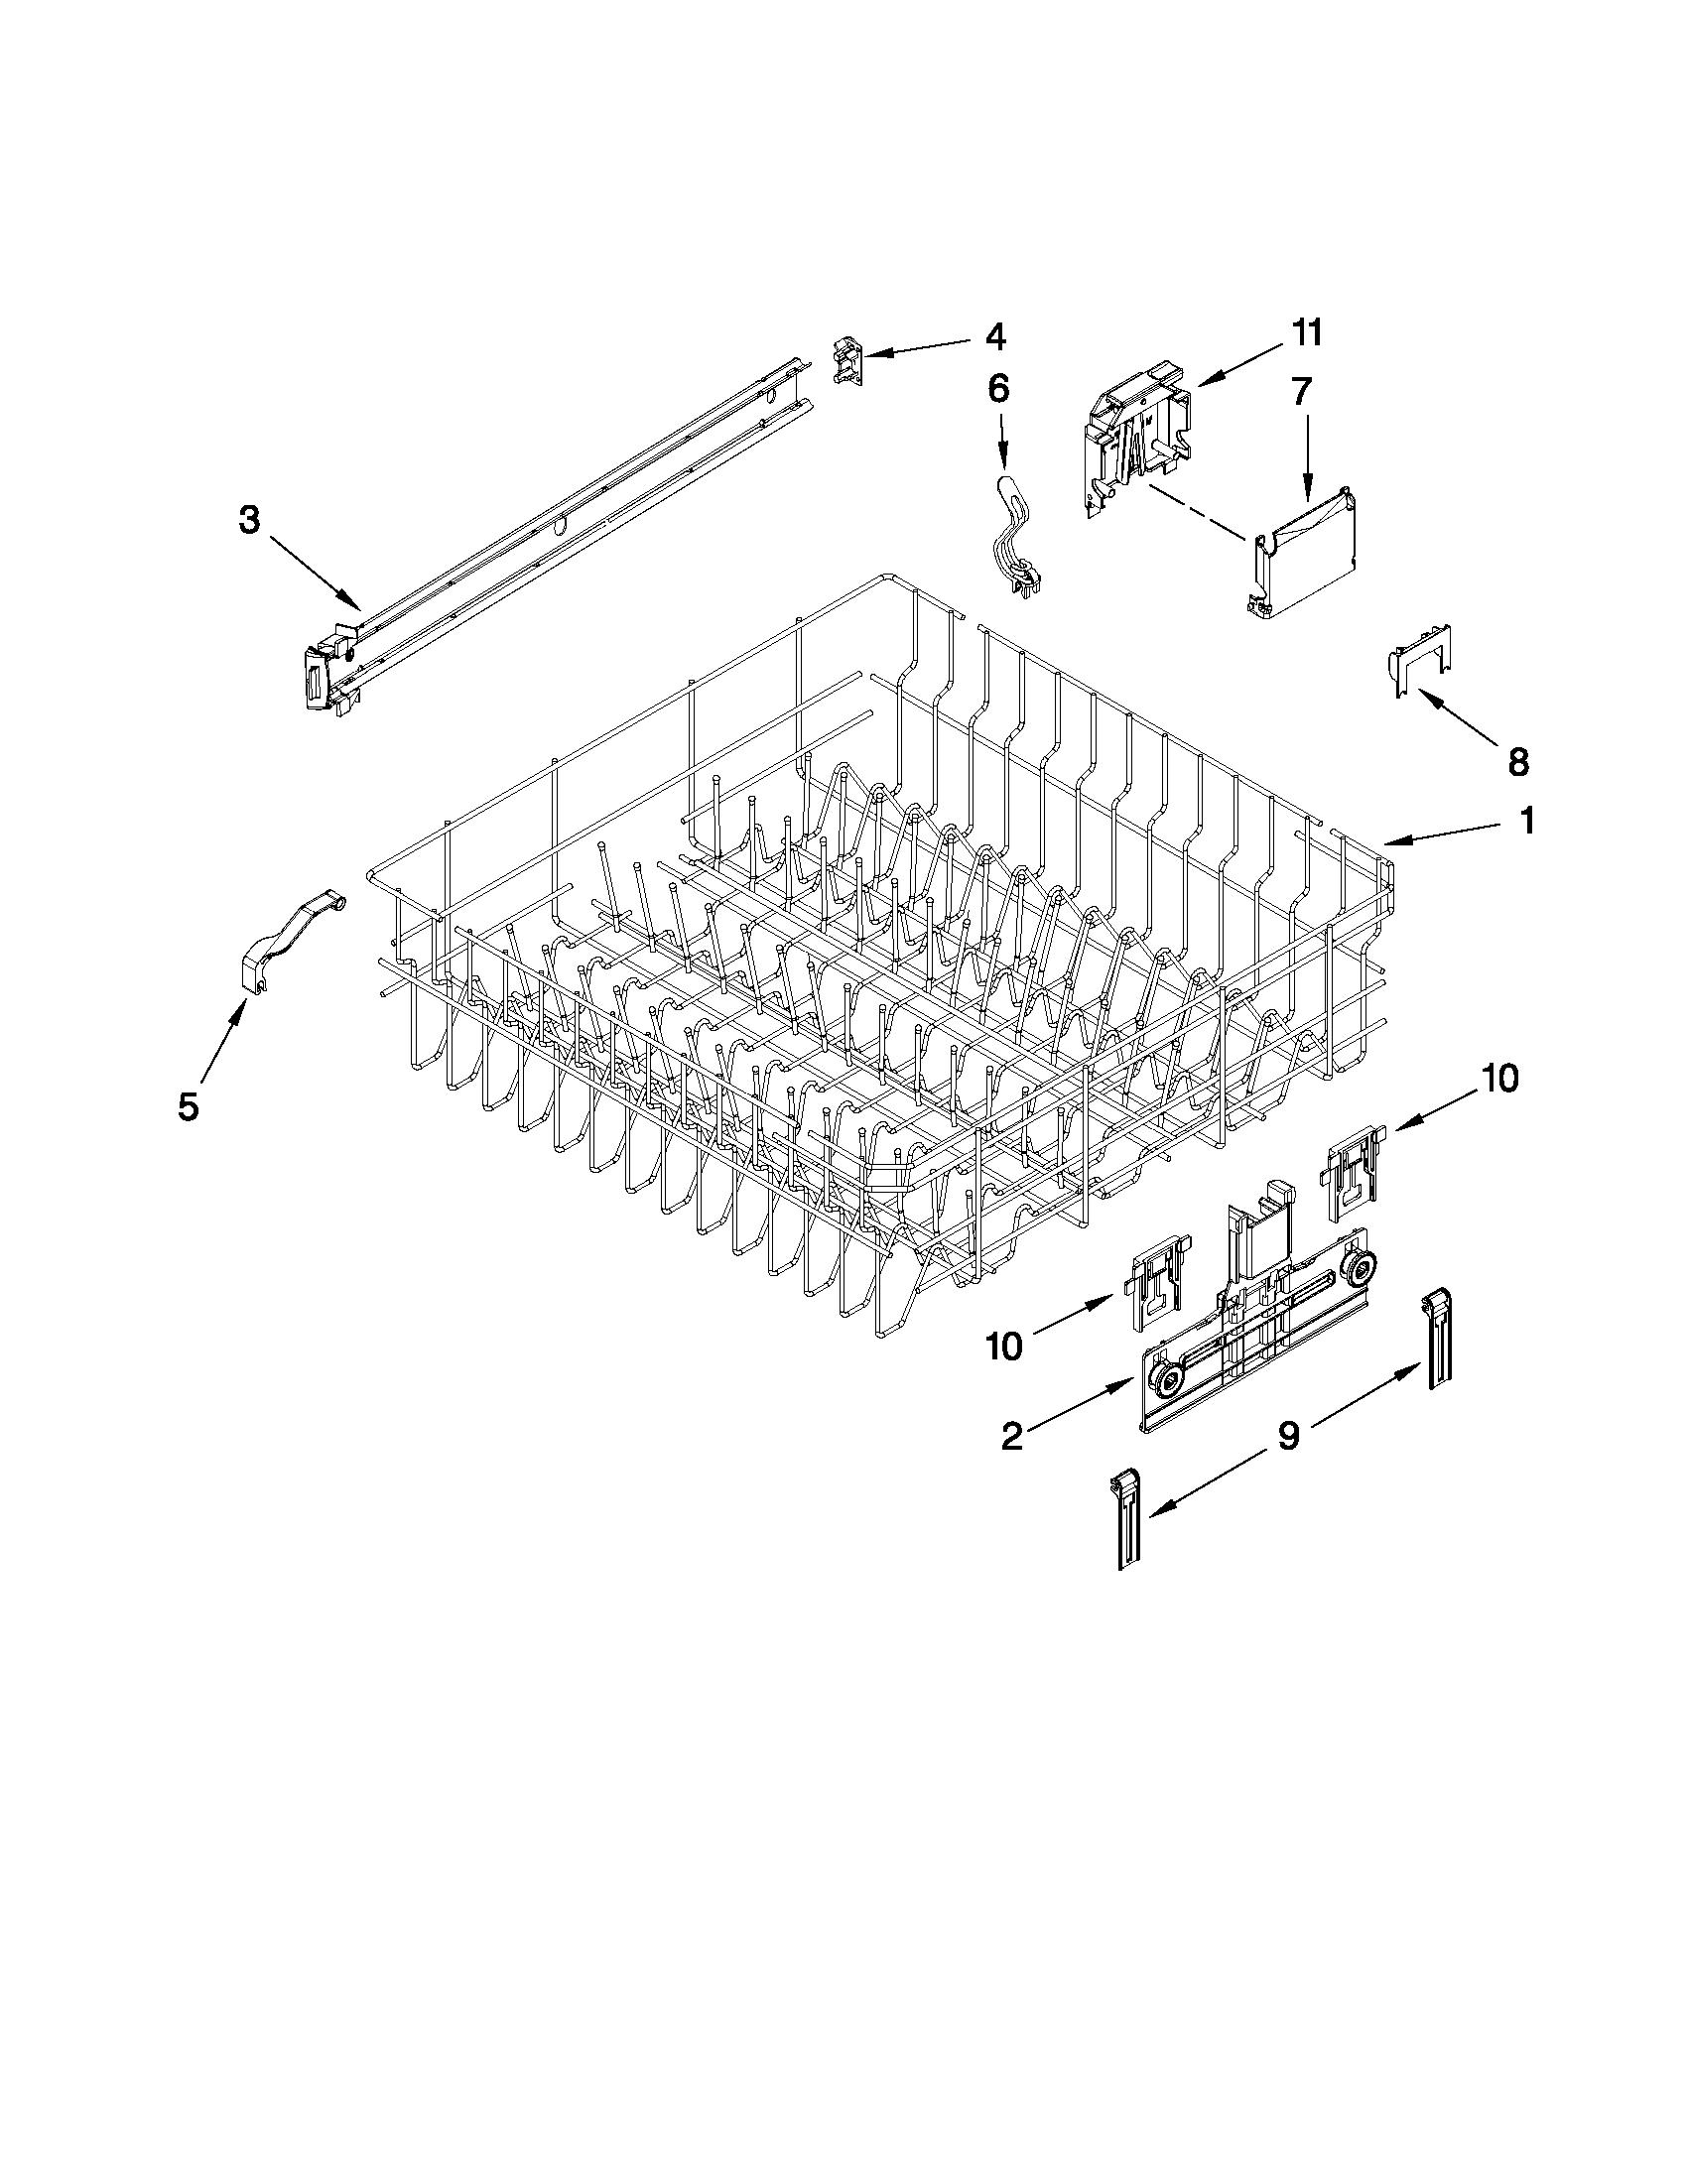 Upper Rack And Track Parts Diagram Parts List For Model 66513042k110 Kenmore Parts Dishwasher Parts Searspartsdirect Dishwasher Parts Kenmore Dishwasher